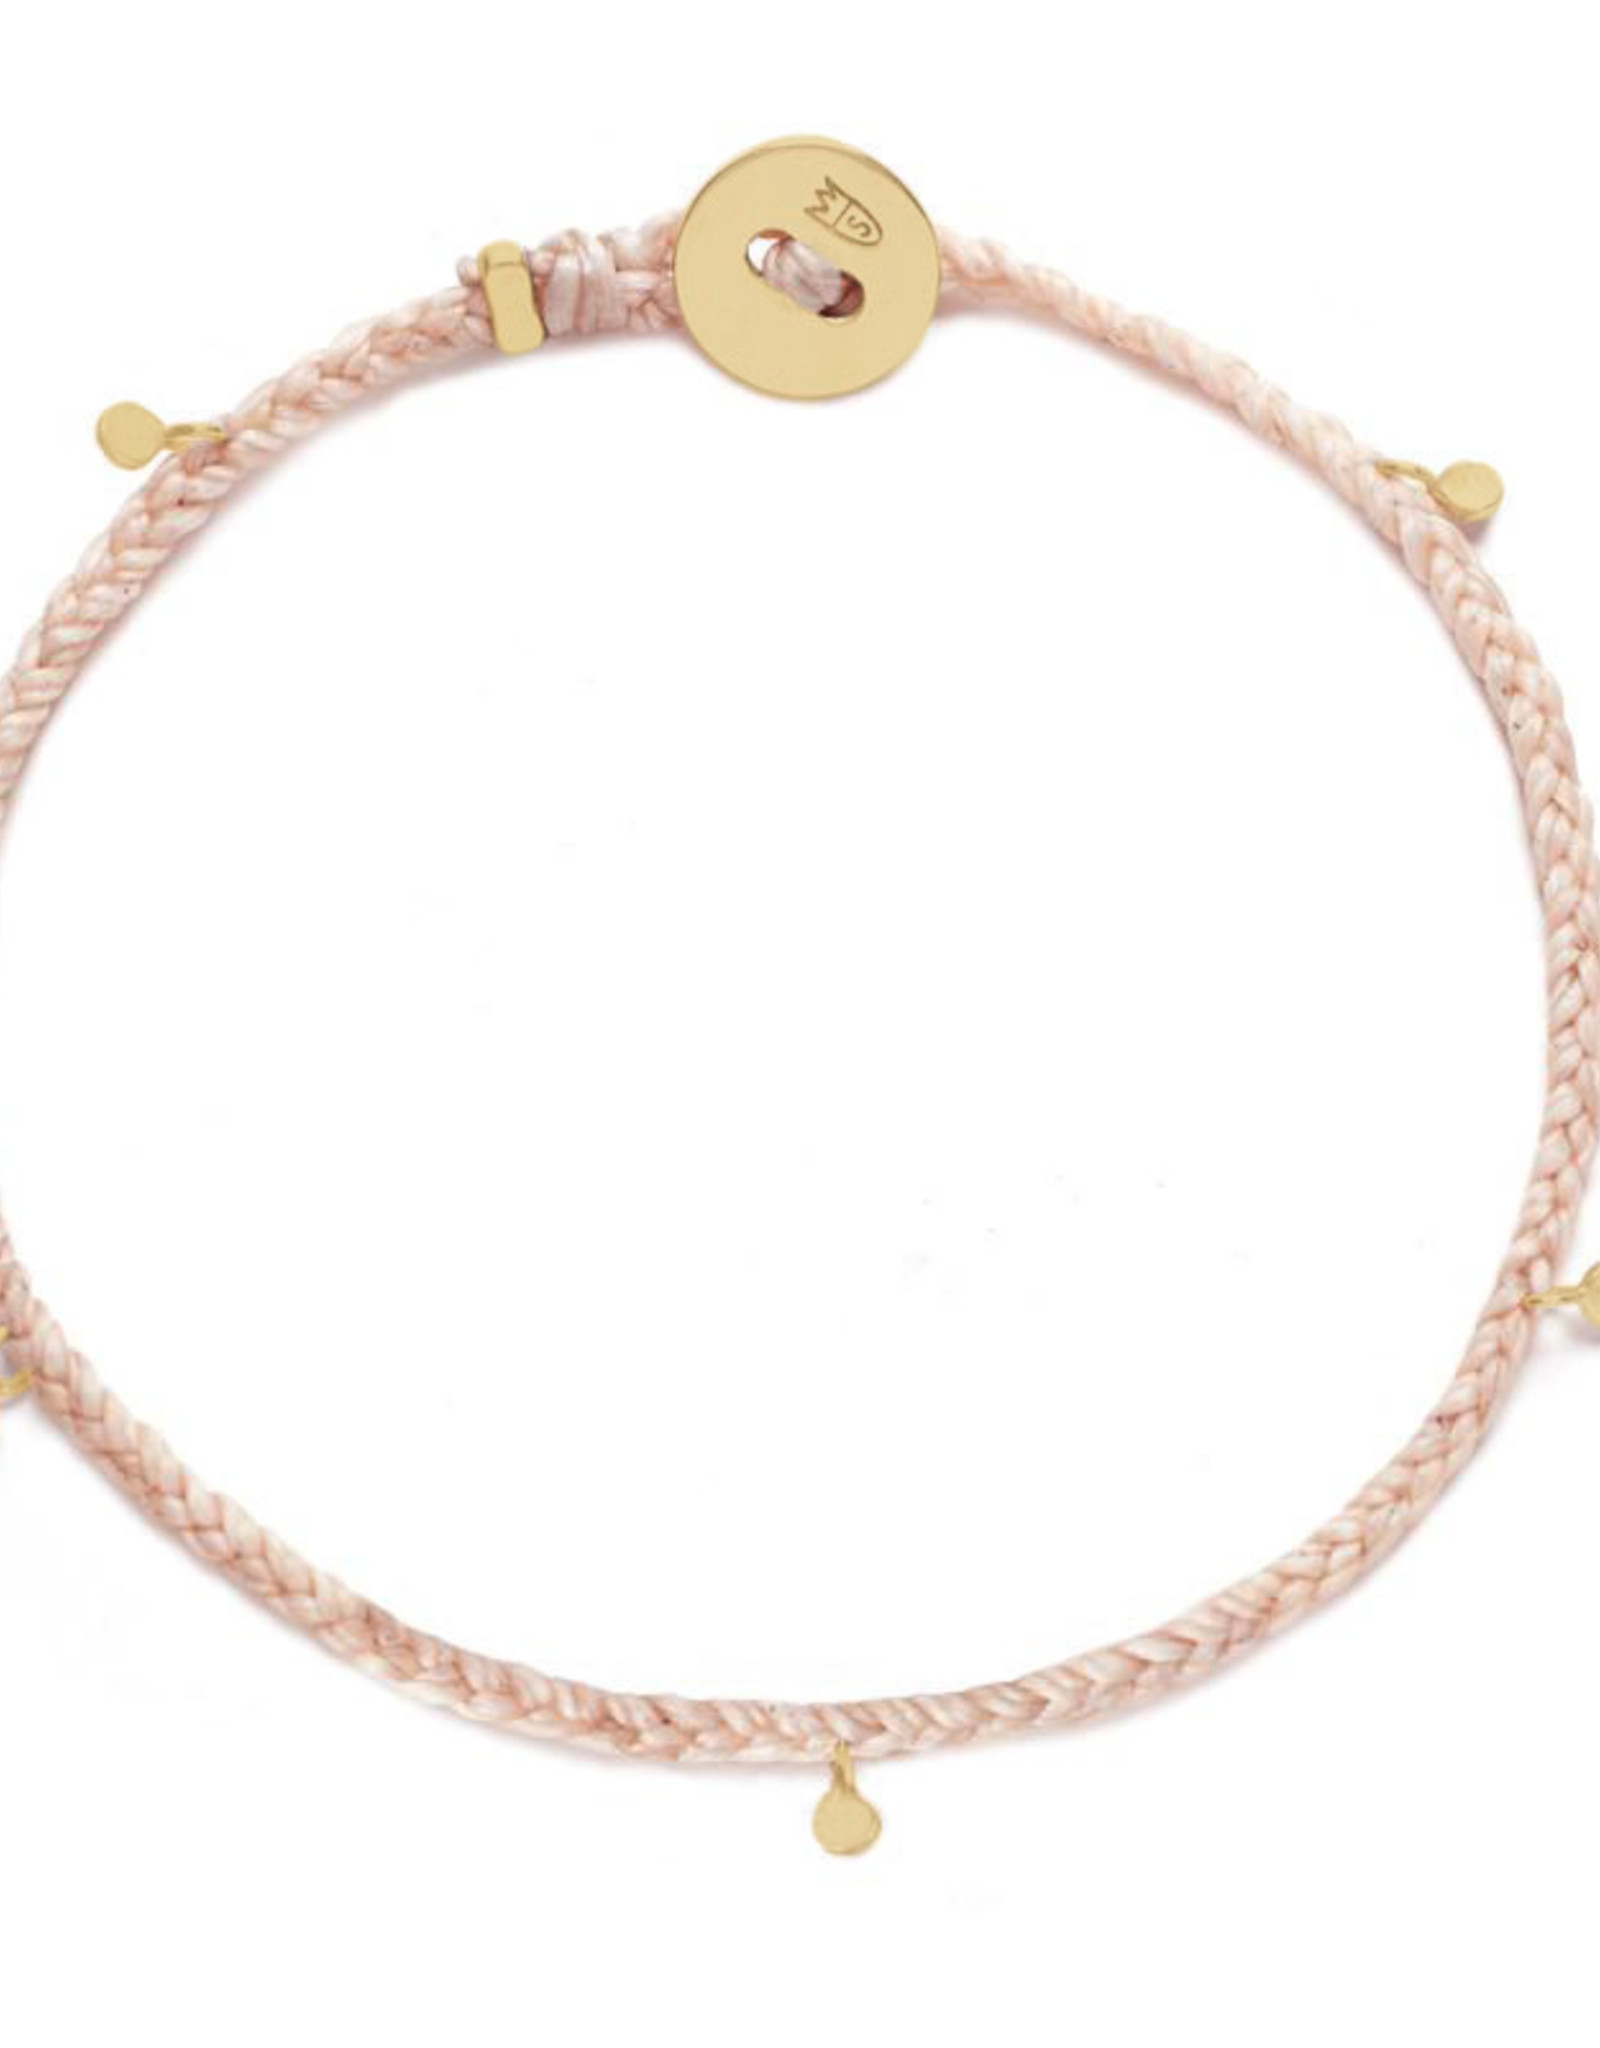 Scosha Fairy Bead Signature Brass Bracelet - Ballet